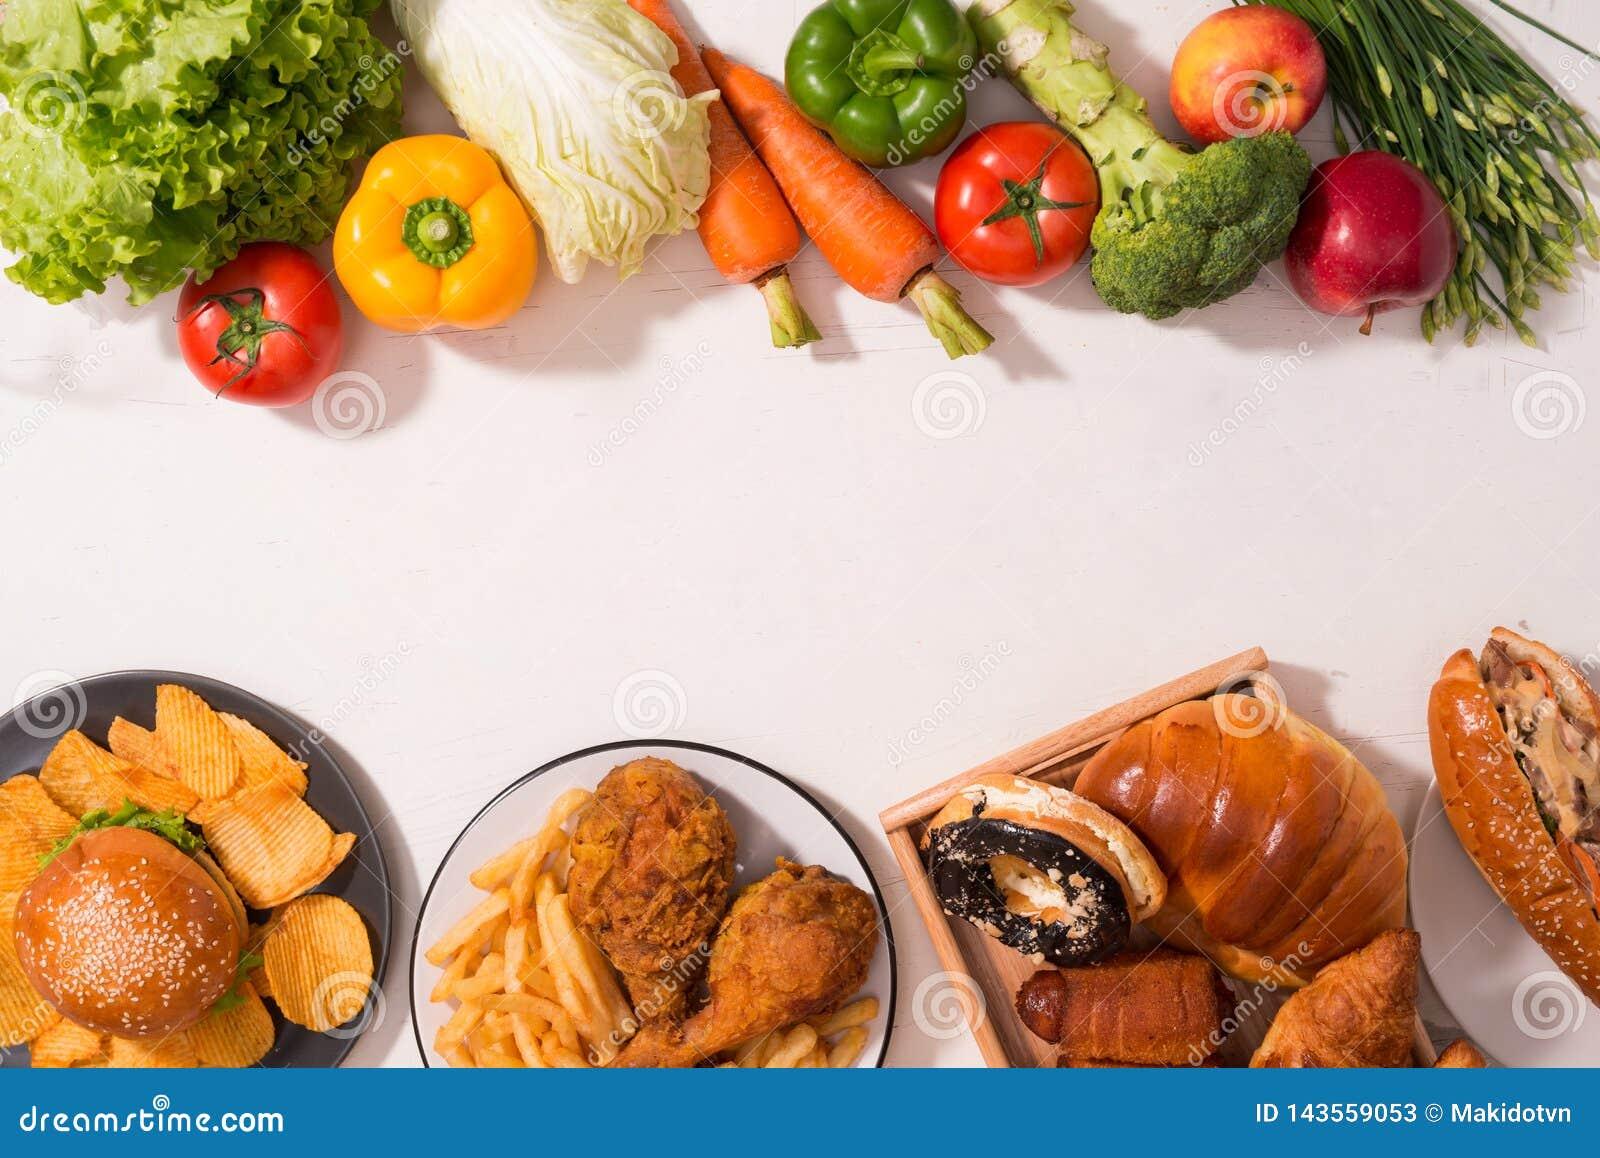 Choosing Between Fruits And Sweets  Healthy Versus Unhealthy